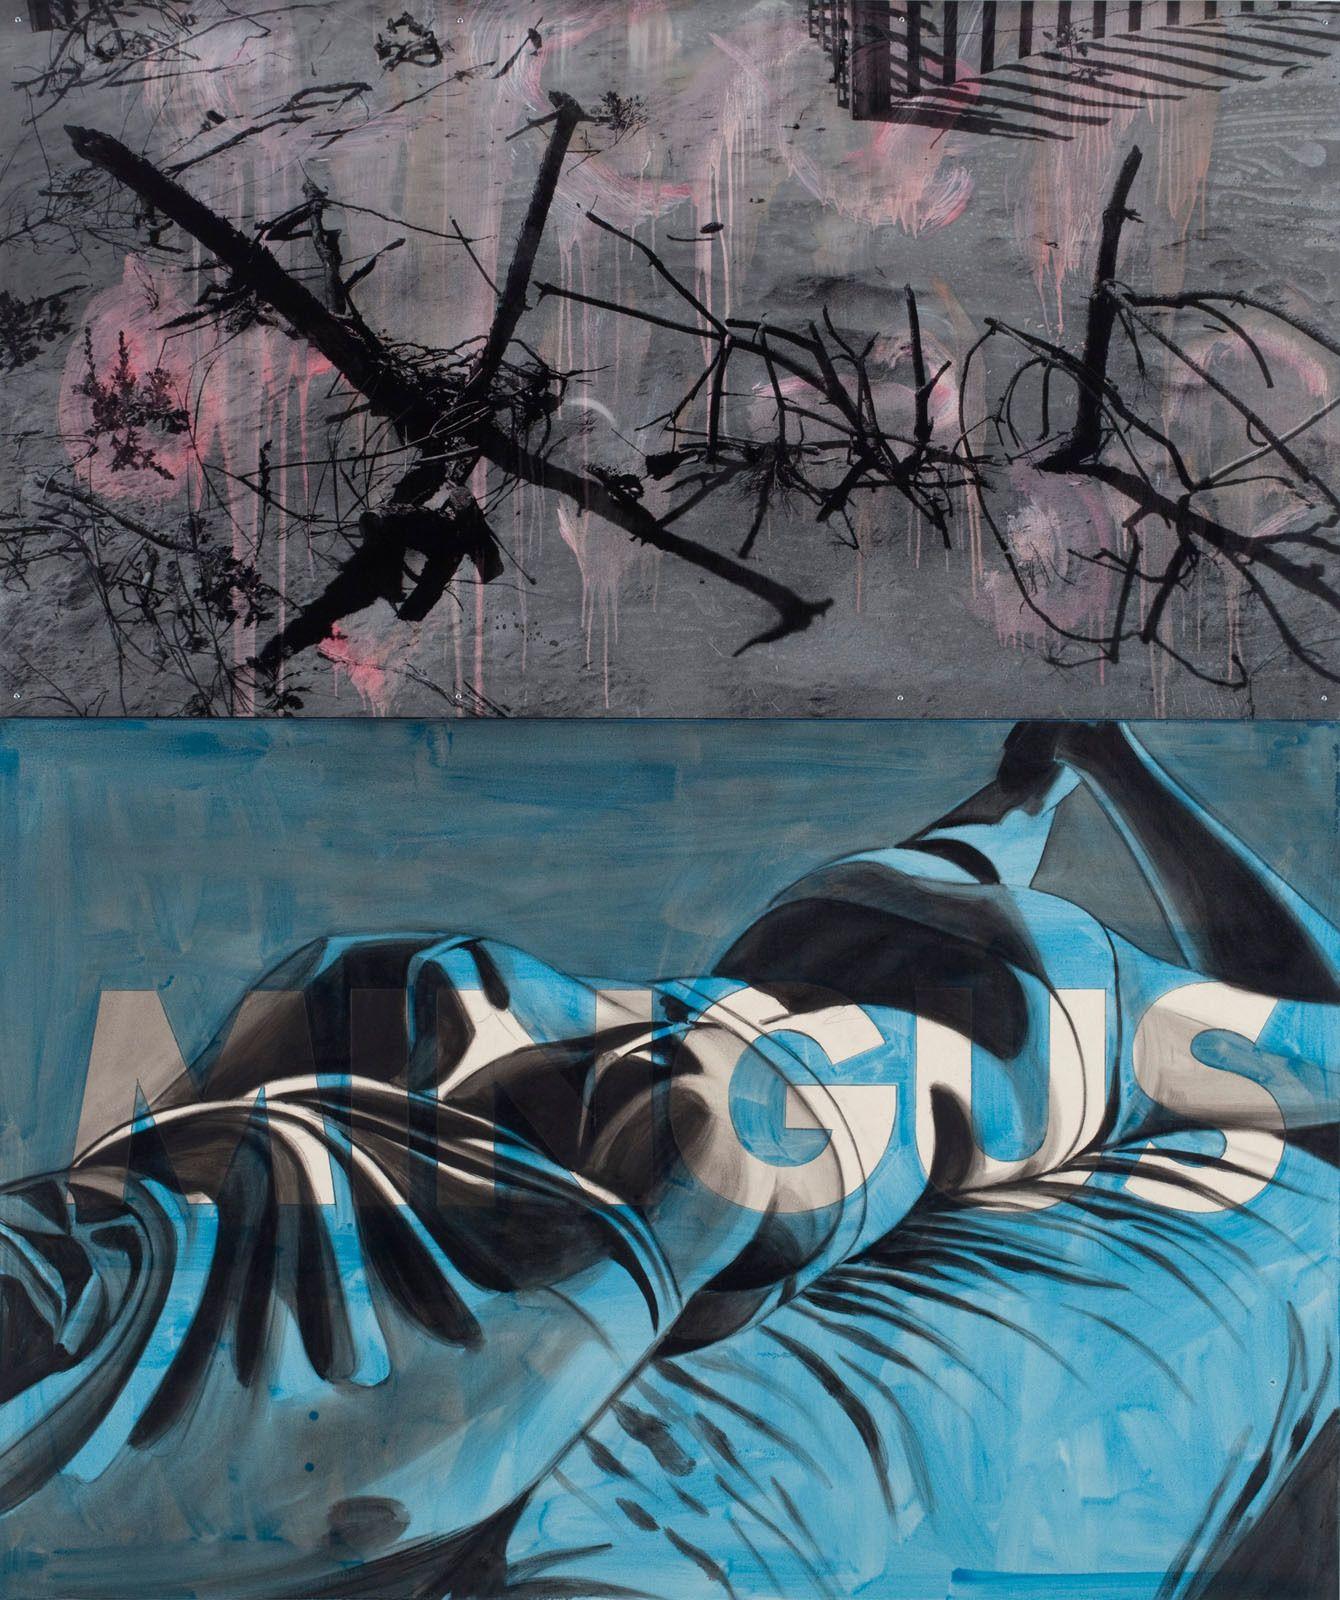 david-salle | David, Art conceptuel, Peinture